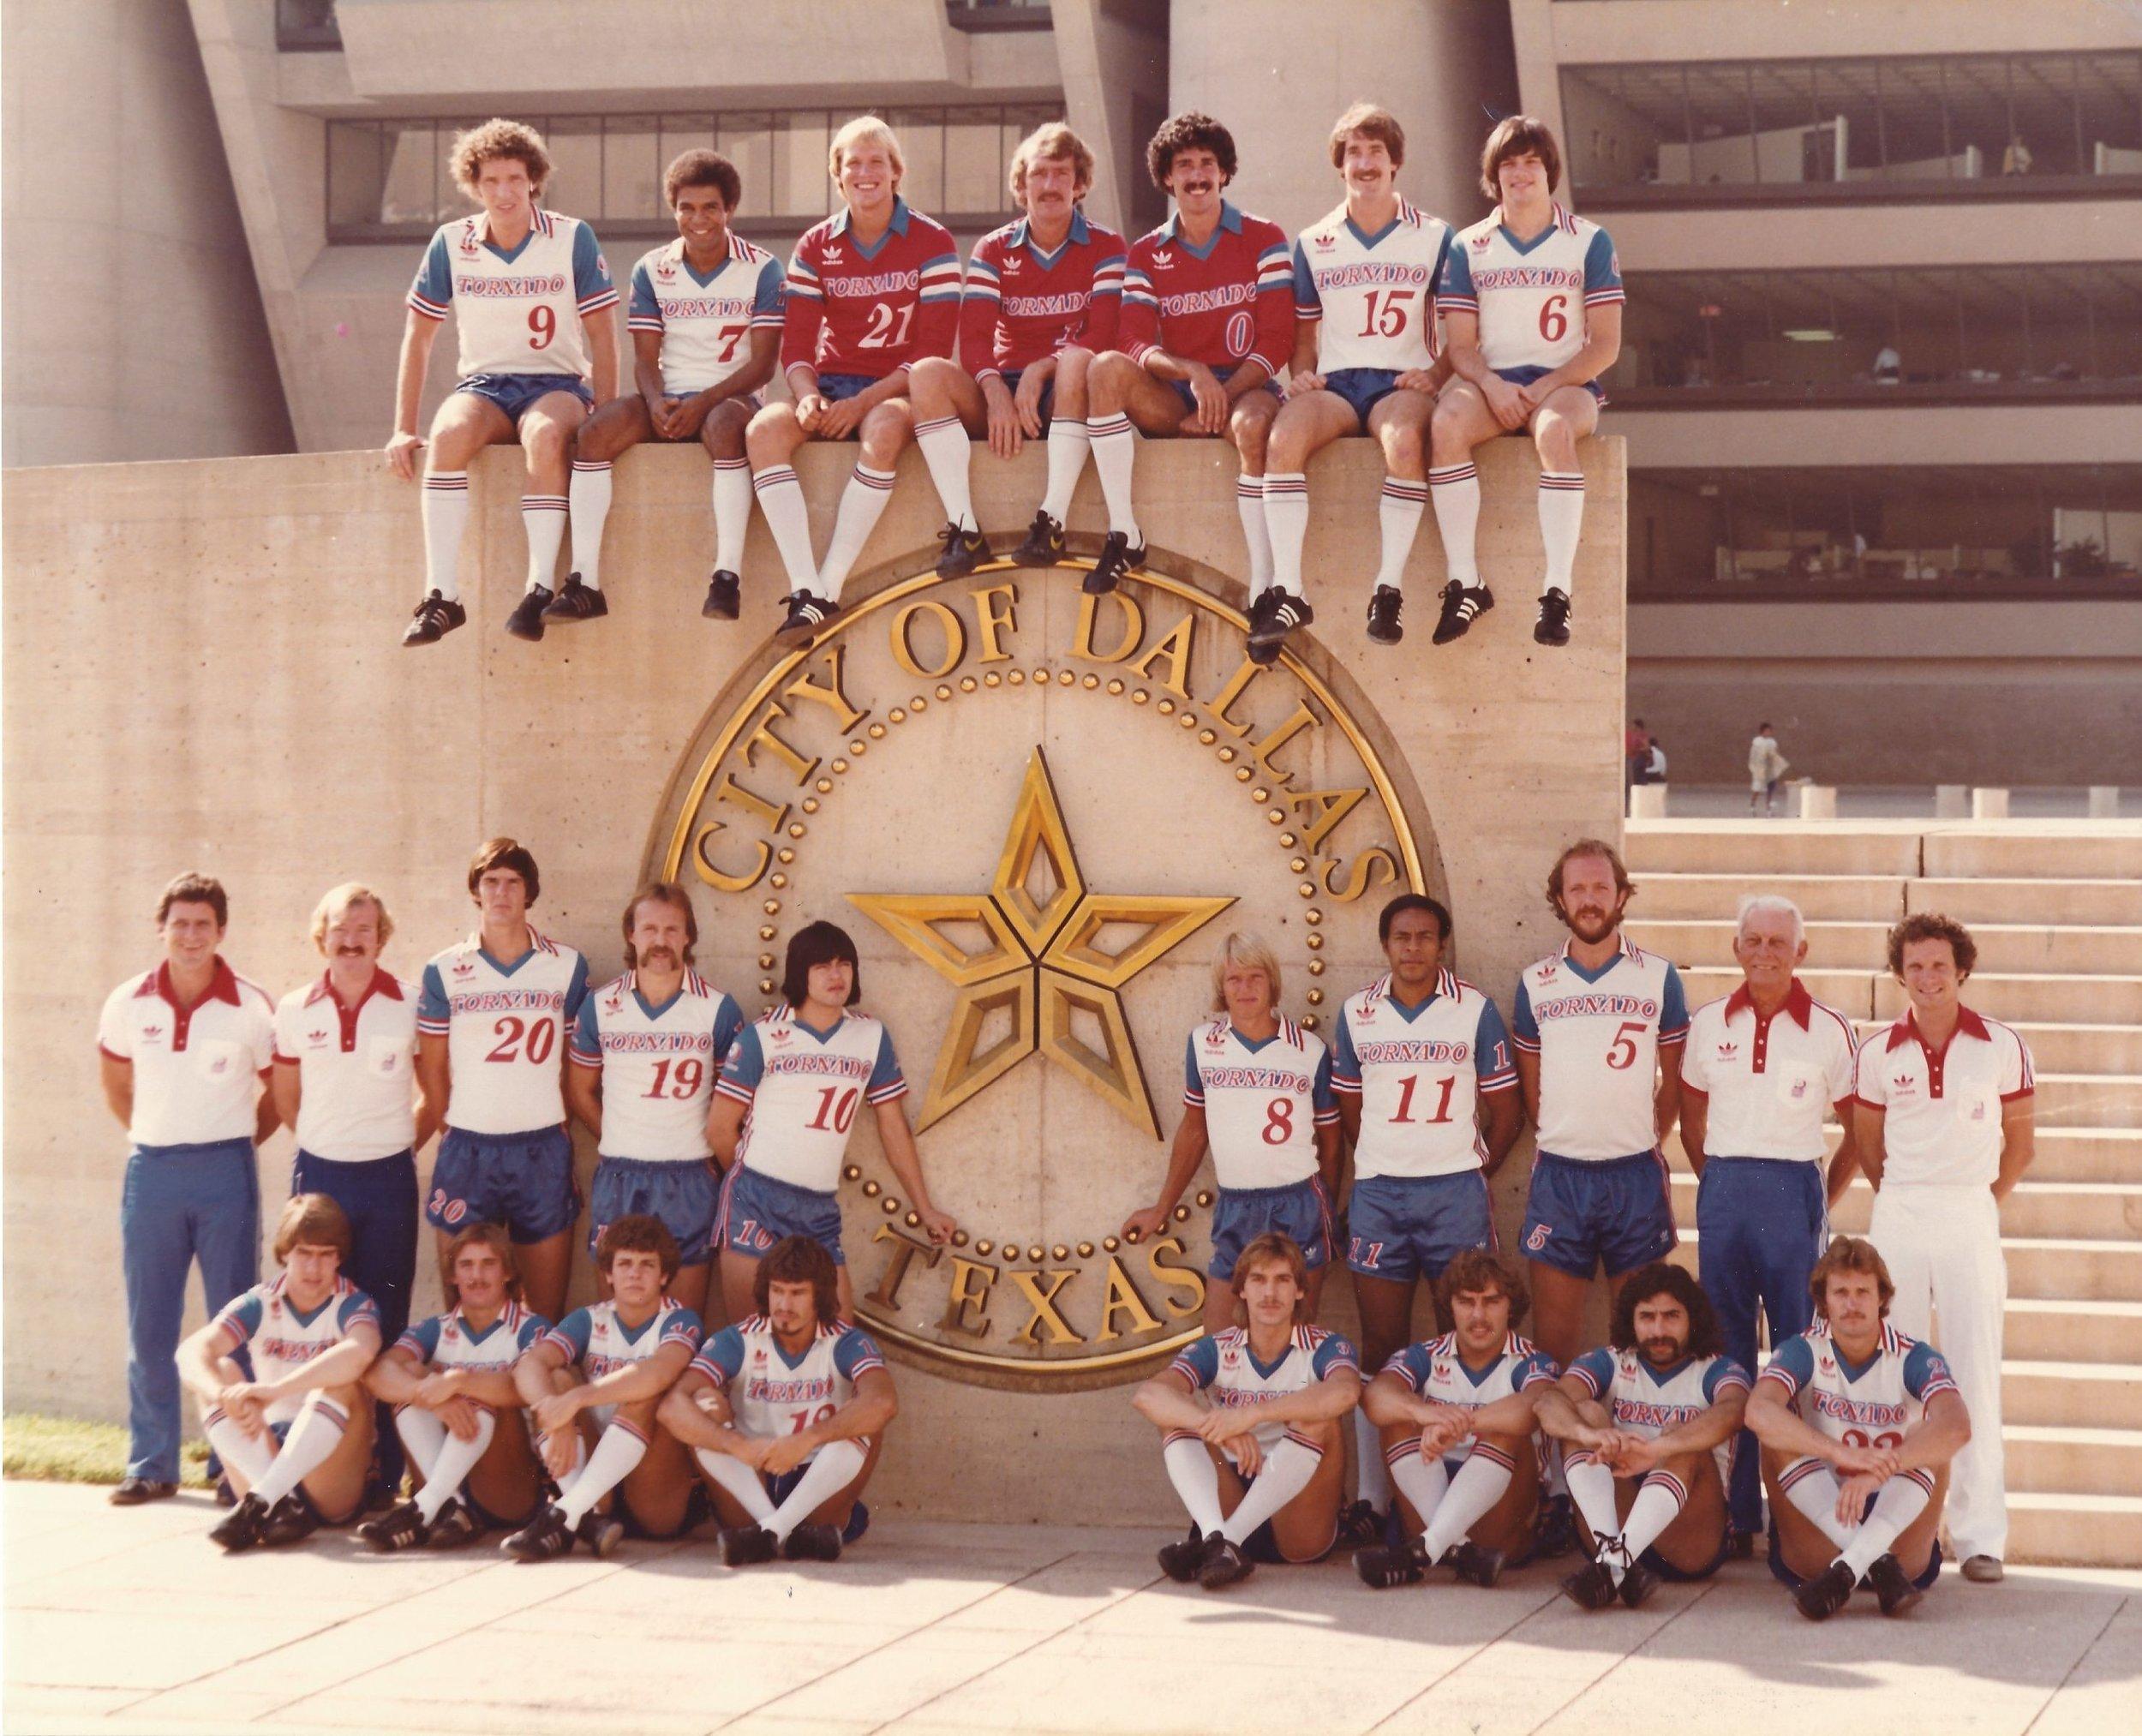 1980 NASL Dallas Tornado Team Picture.jpg